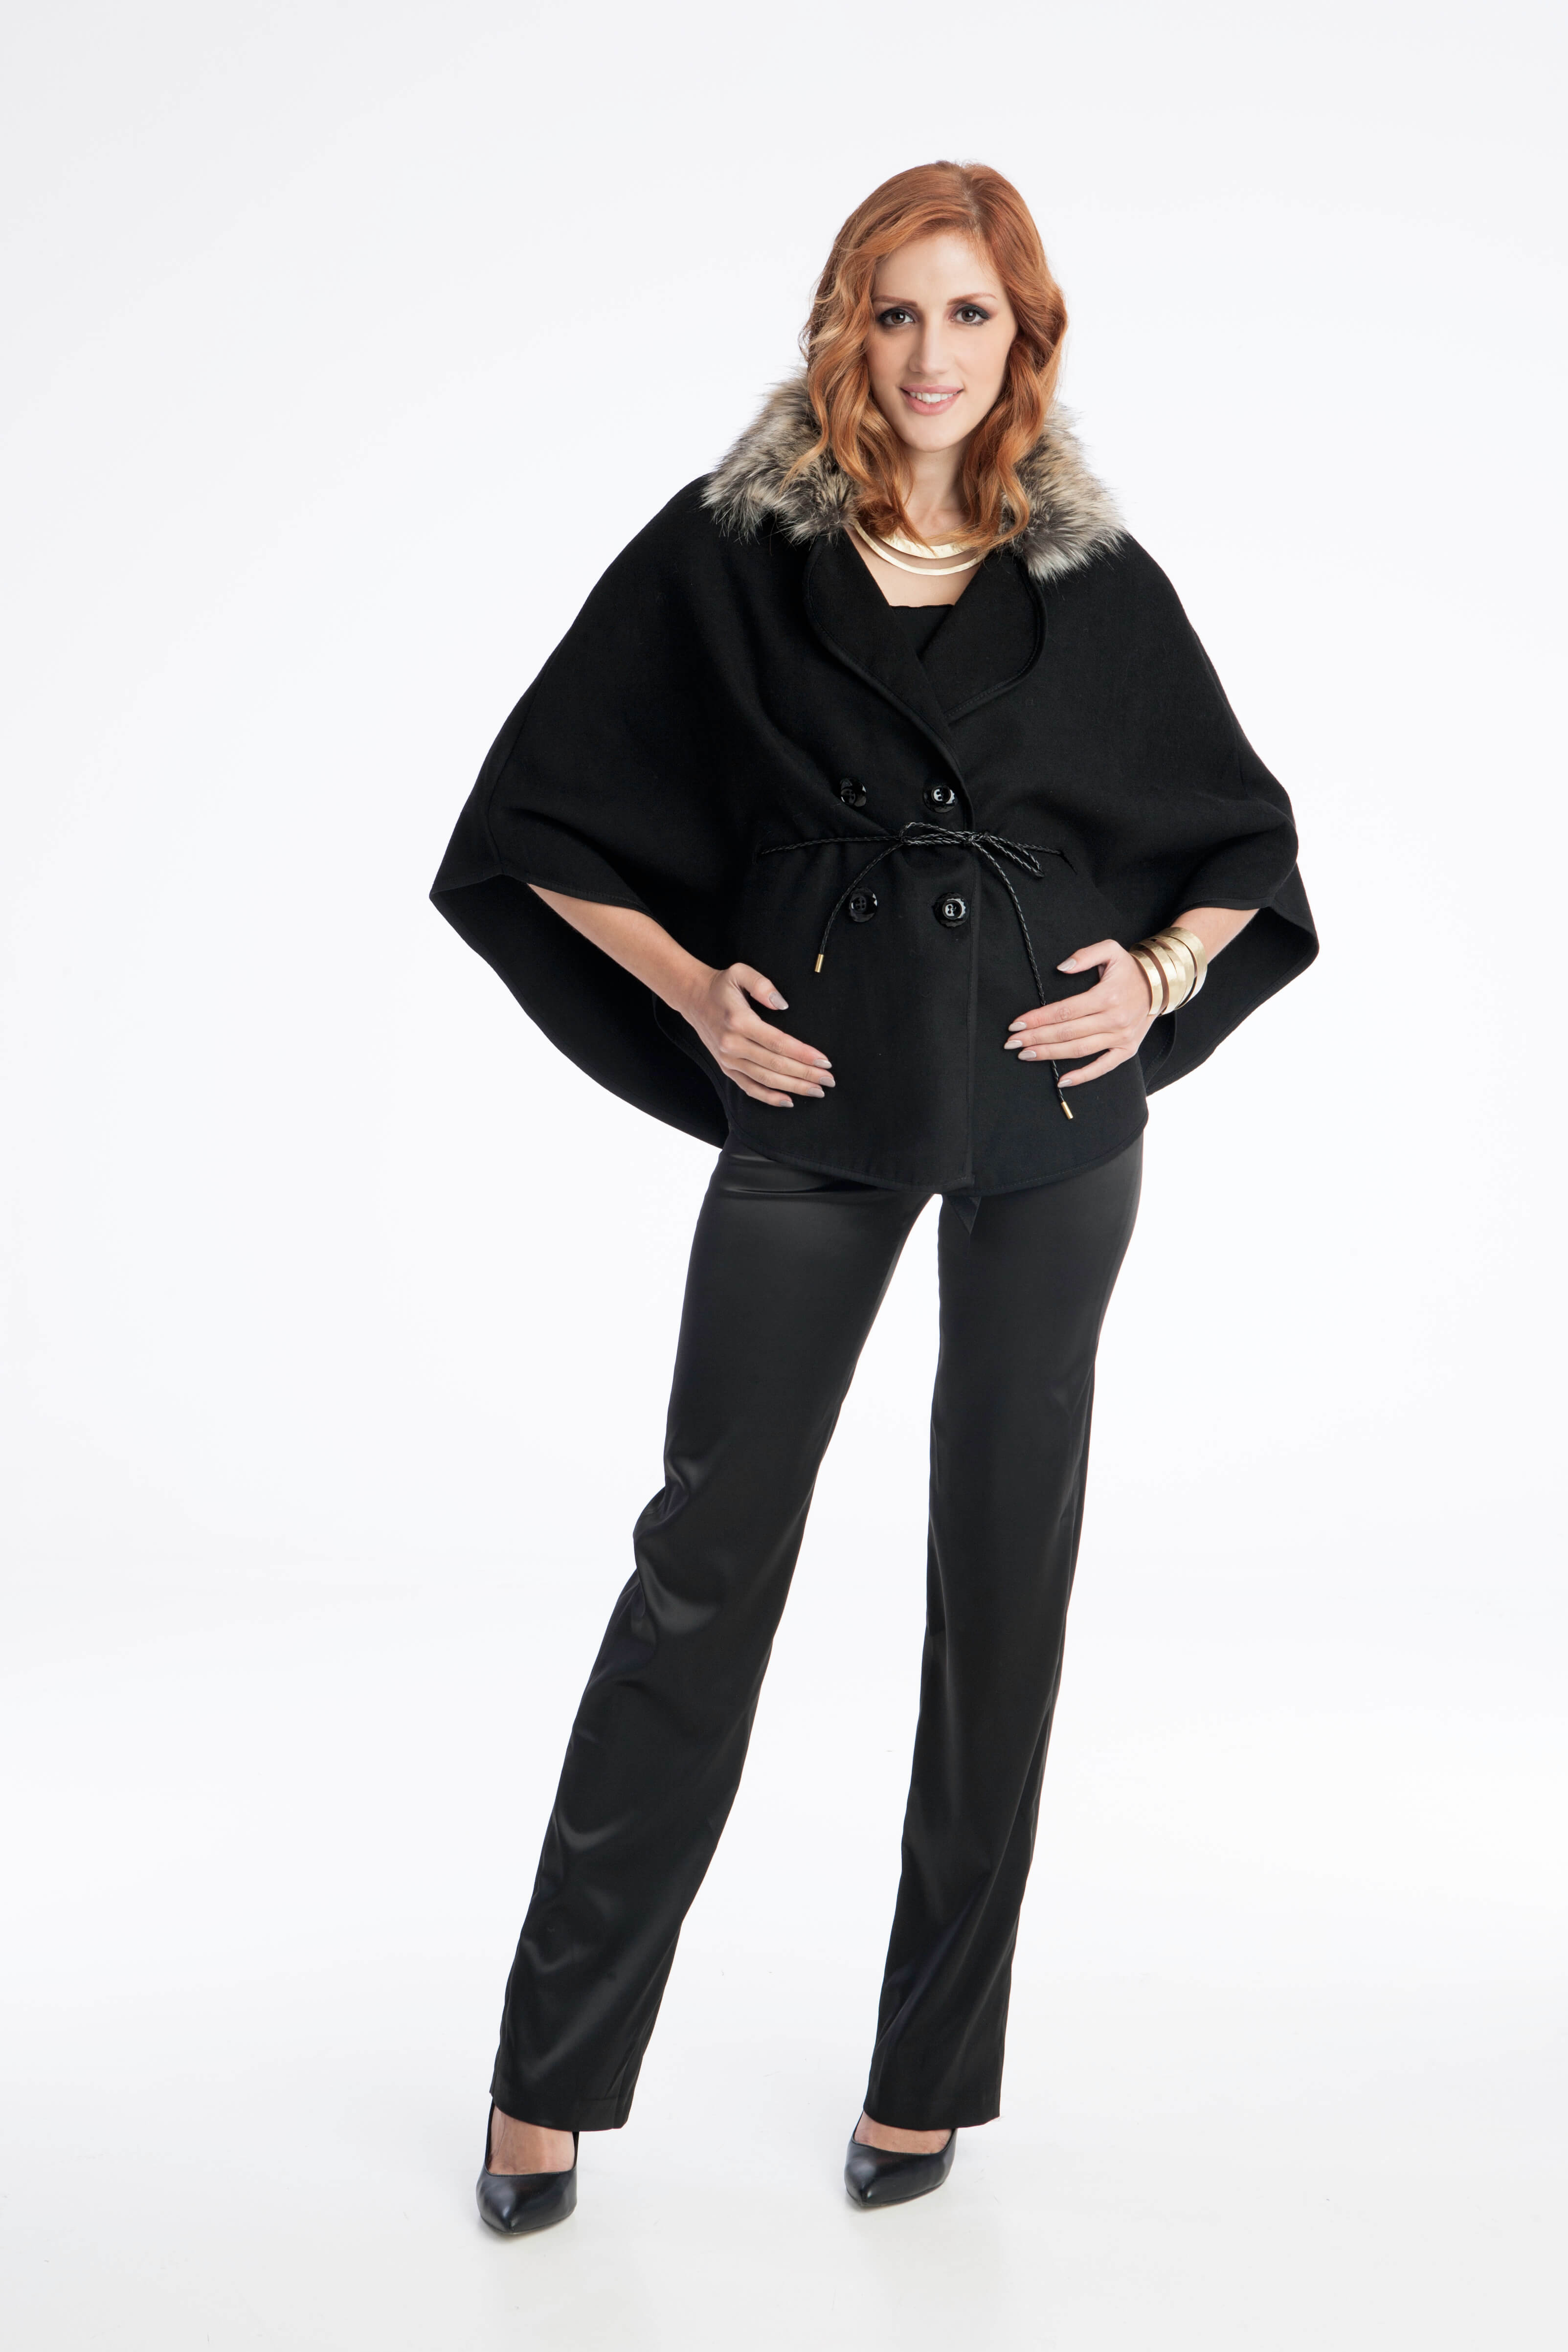 039682546aea Black Archives - Page 6 of 10 - Prestige Fashion